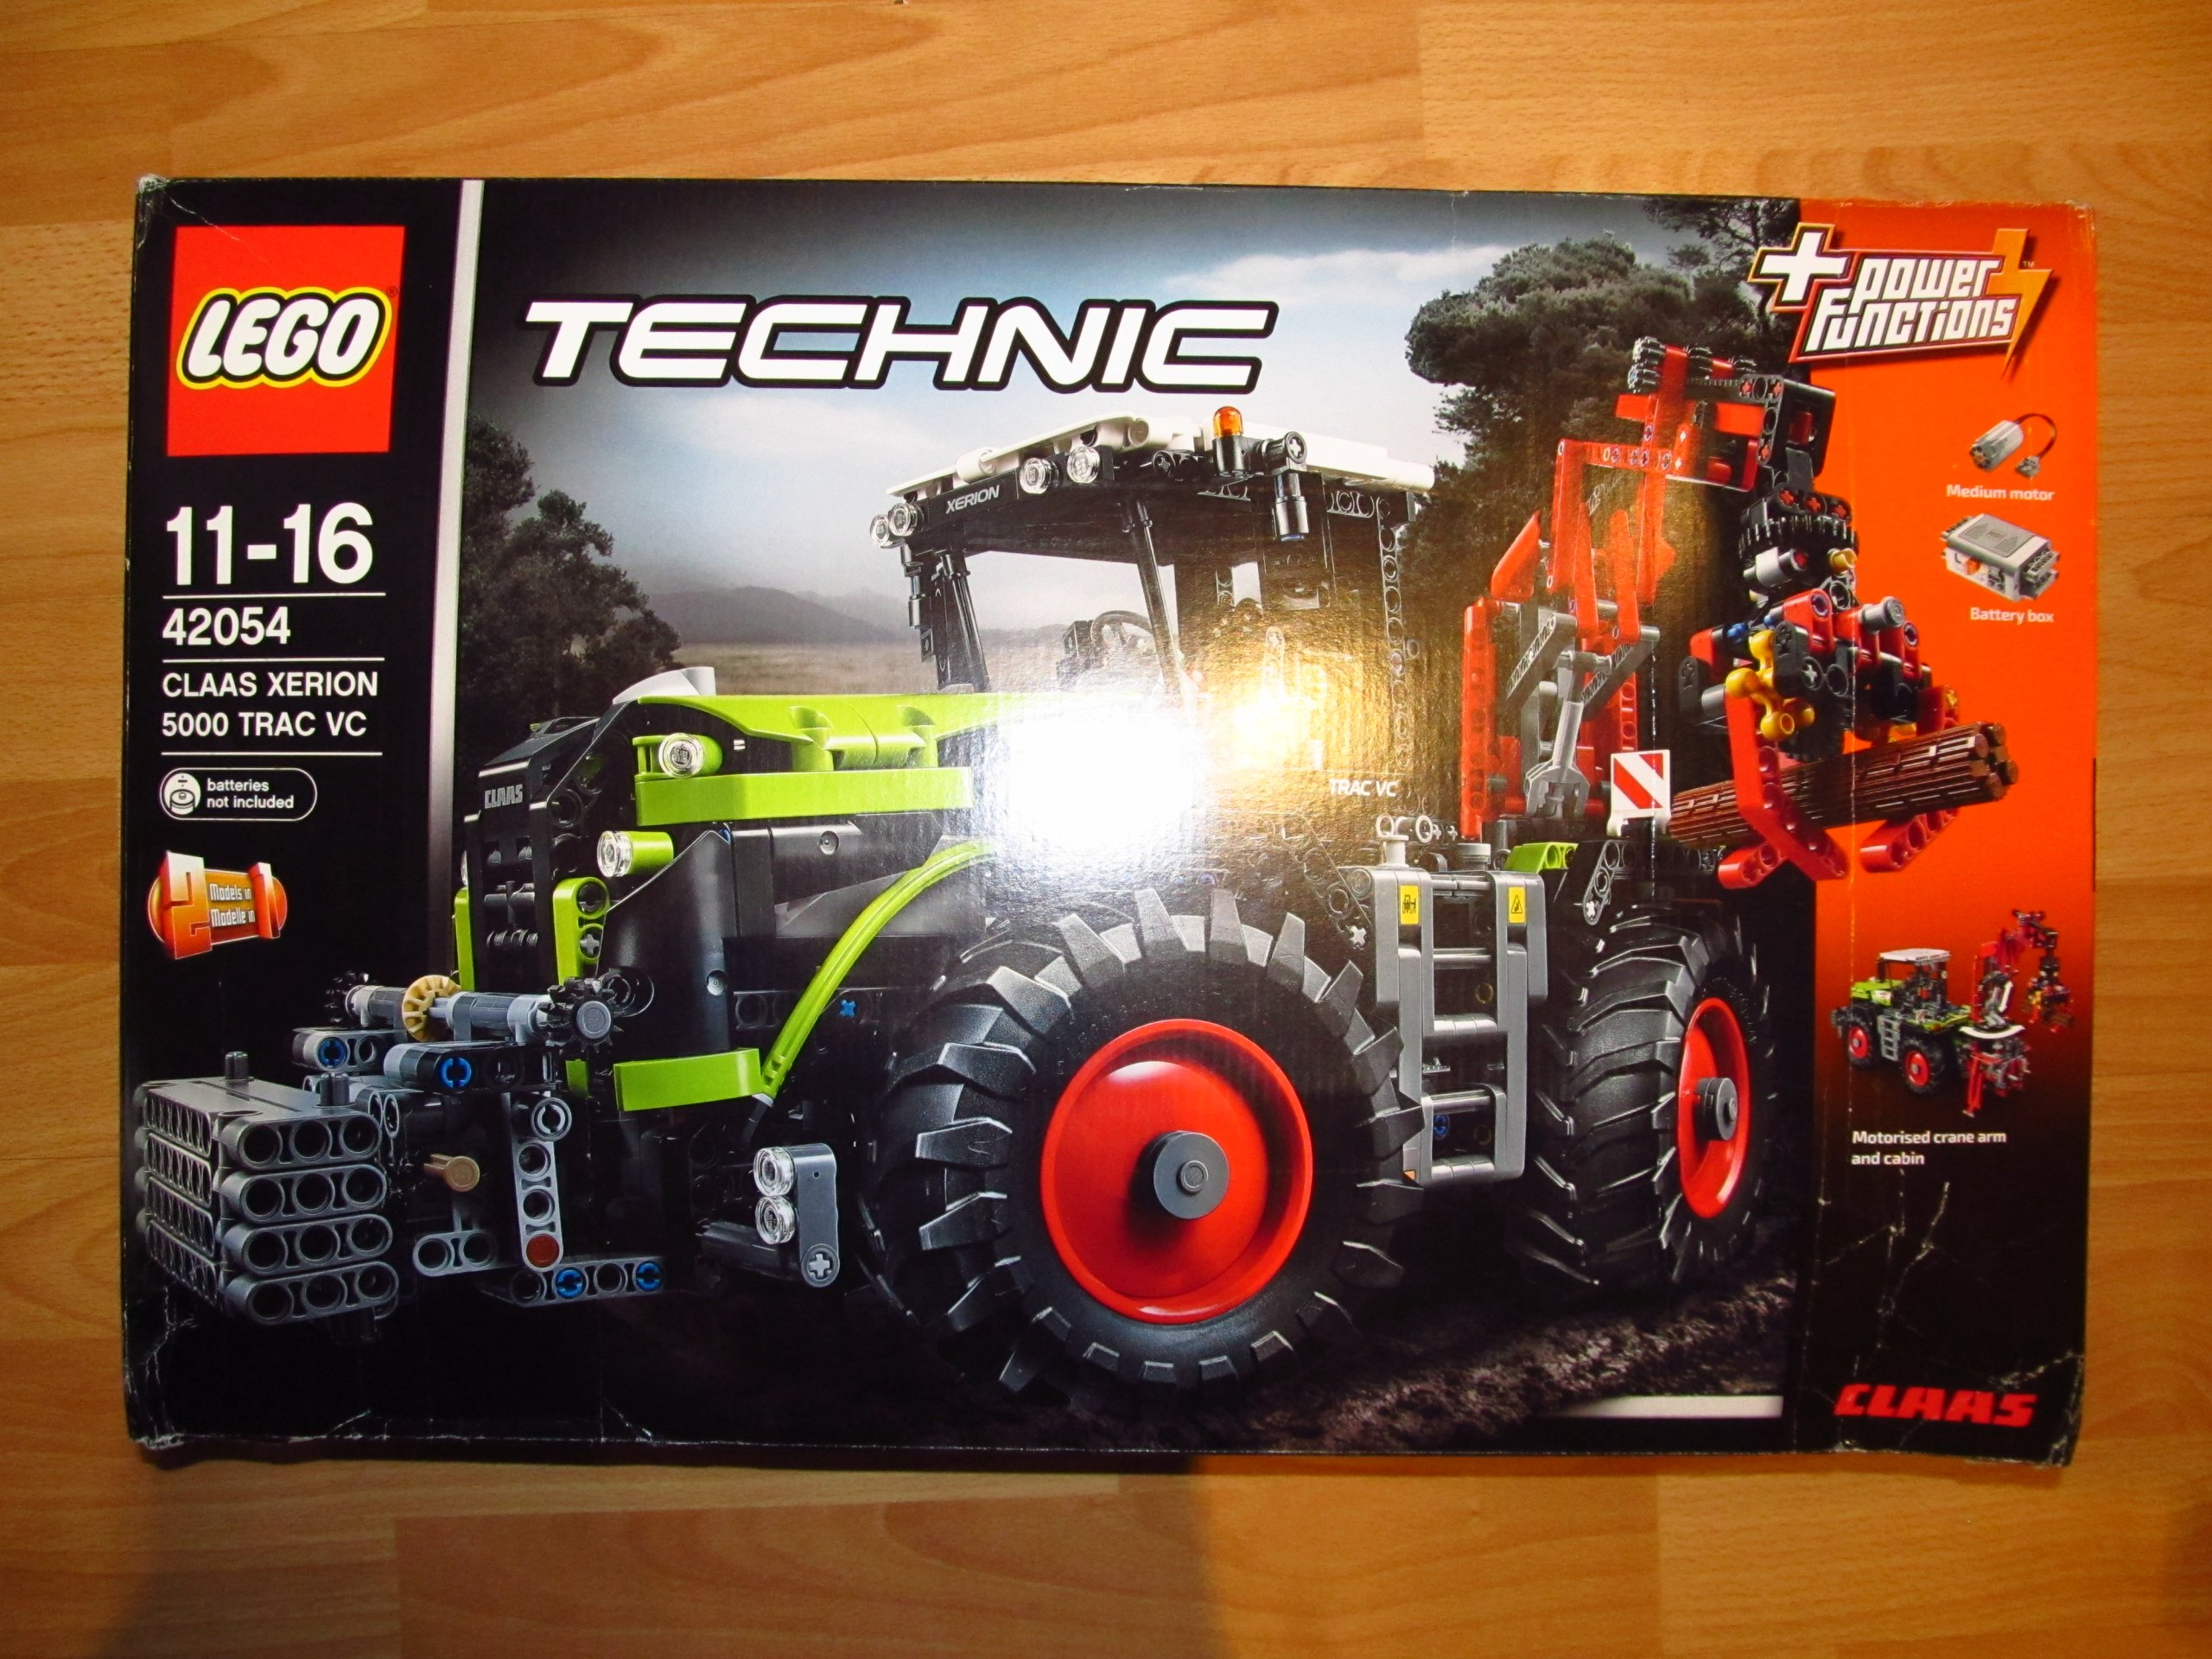 LEGO Technic CLAAS XERION 5000 TRAC 42054